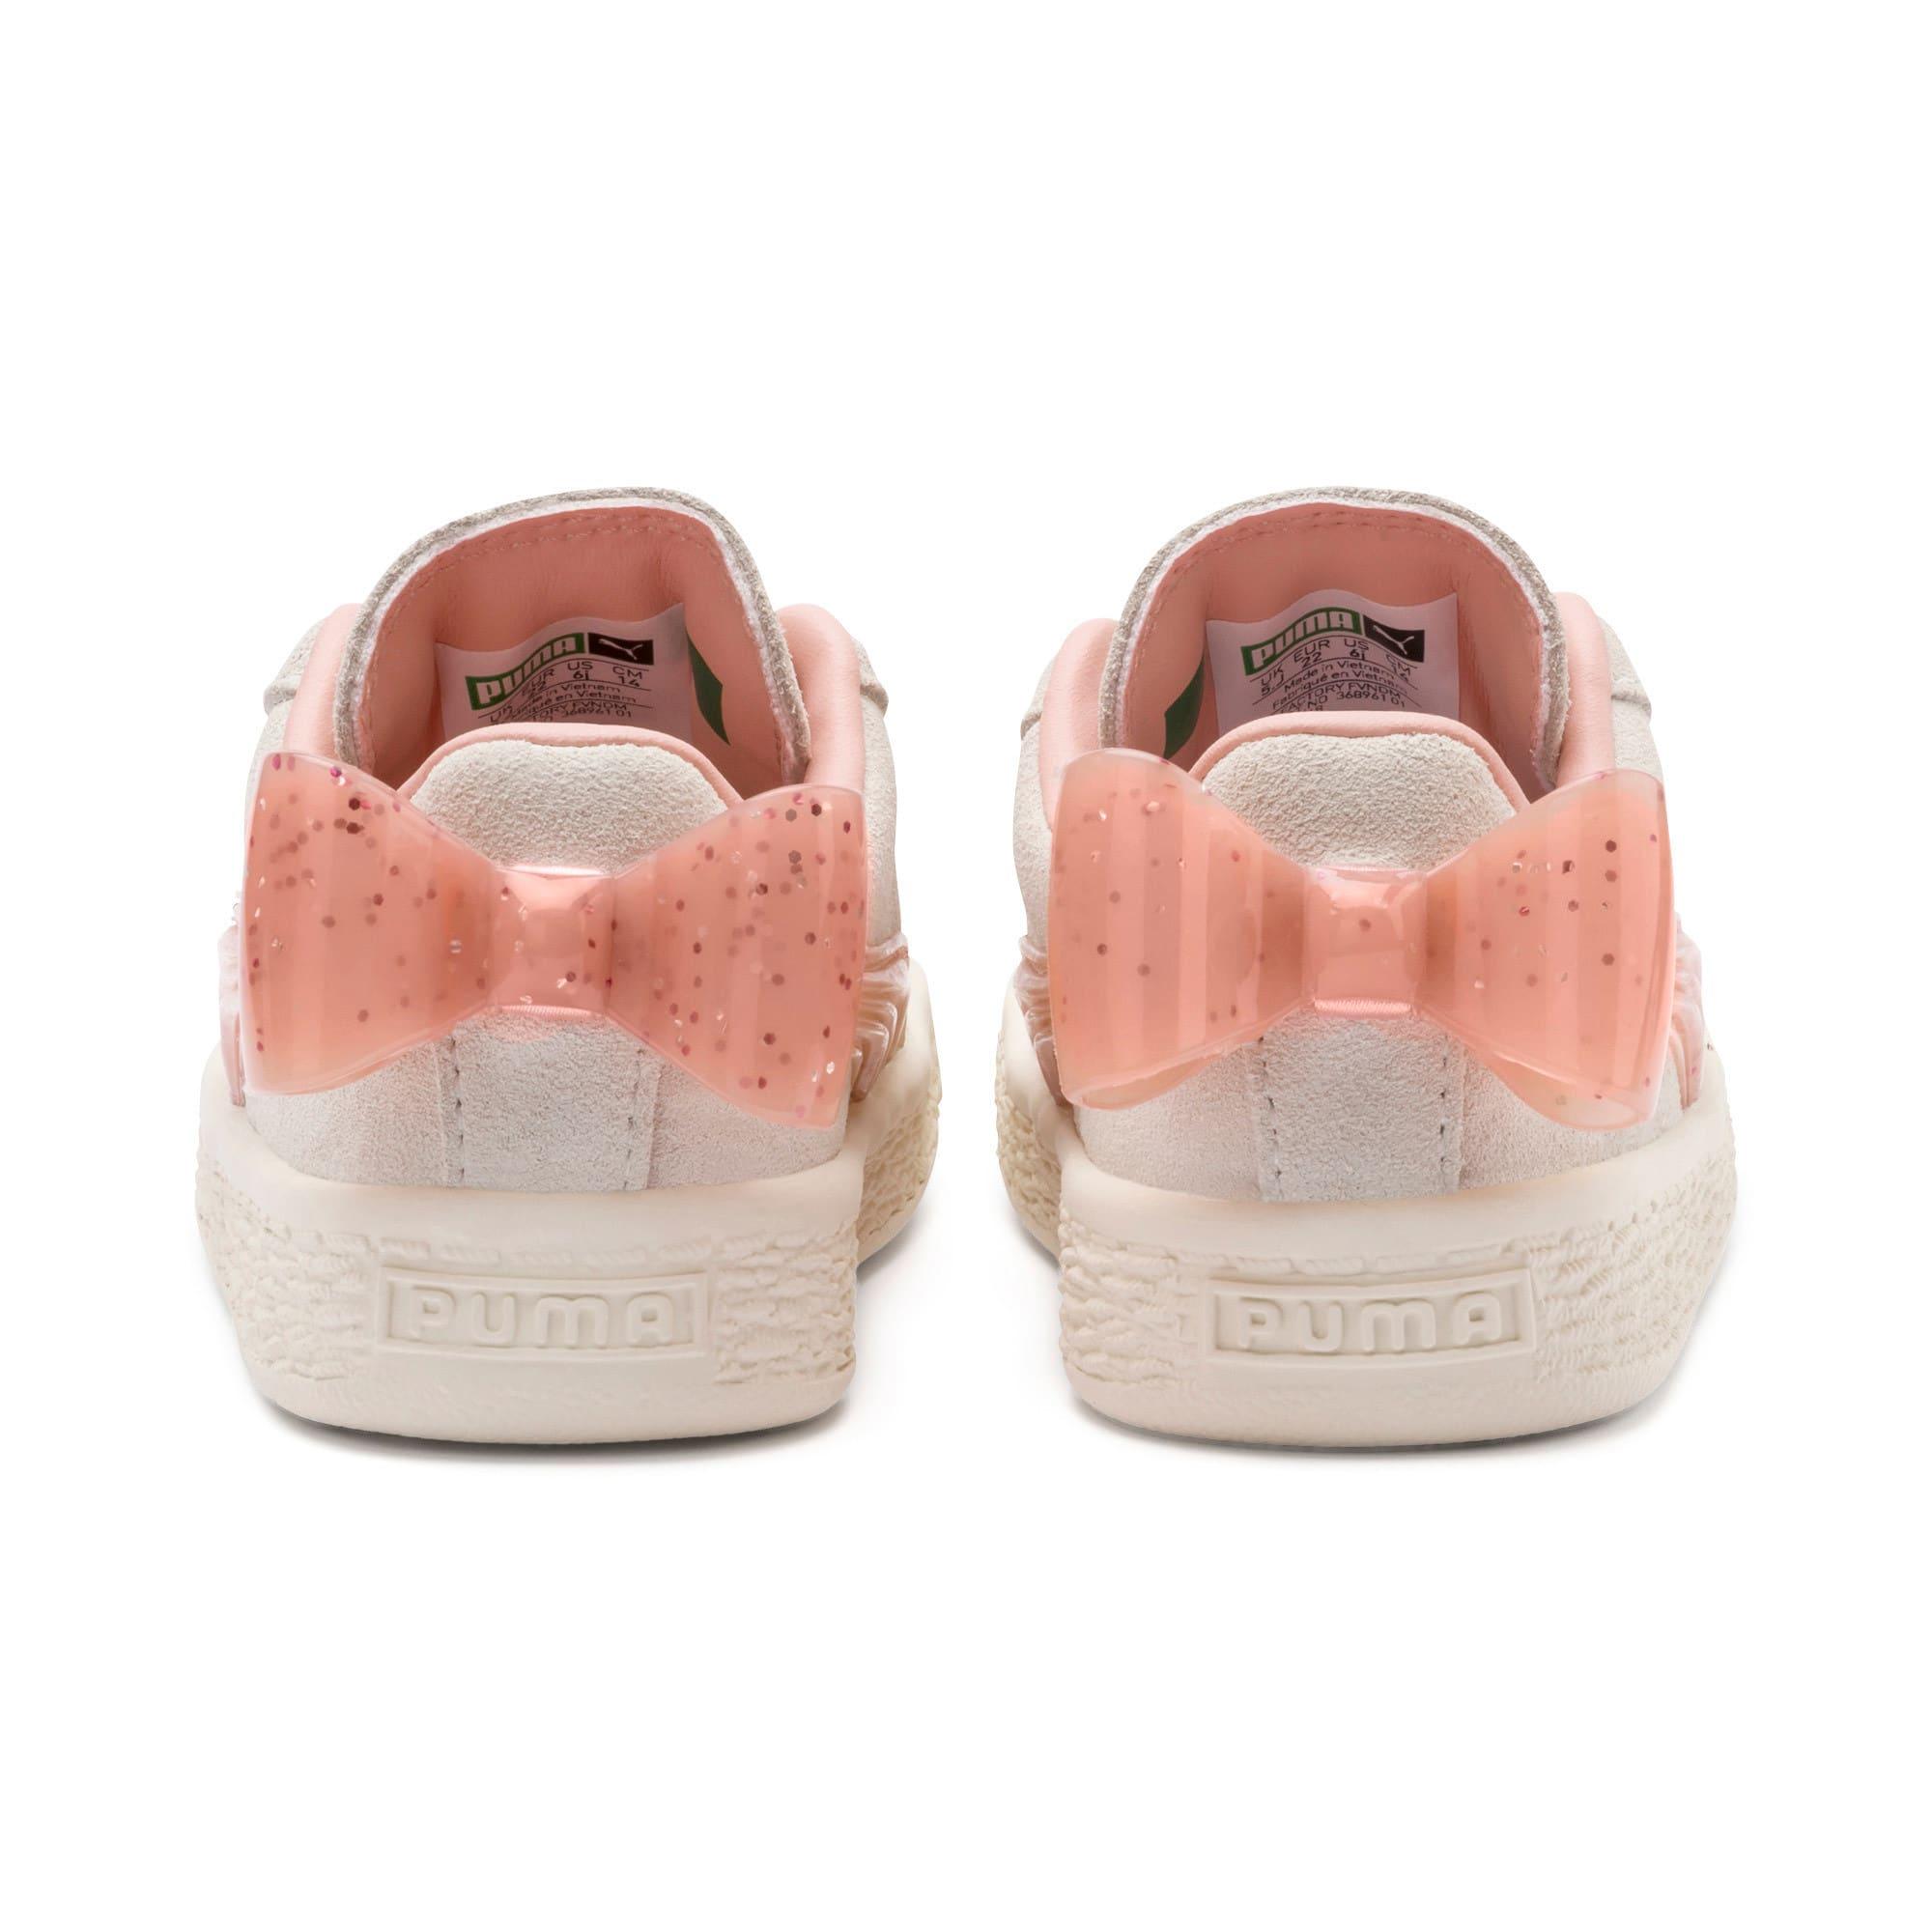 Miniatura 3 de Zapatos Suede Jelly Bow AC para niños, Whis White-Peach Bud-Silver, mediano